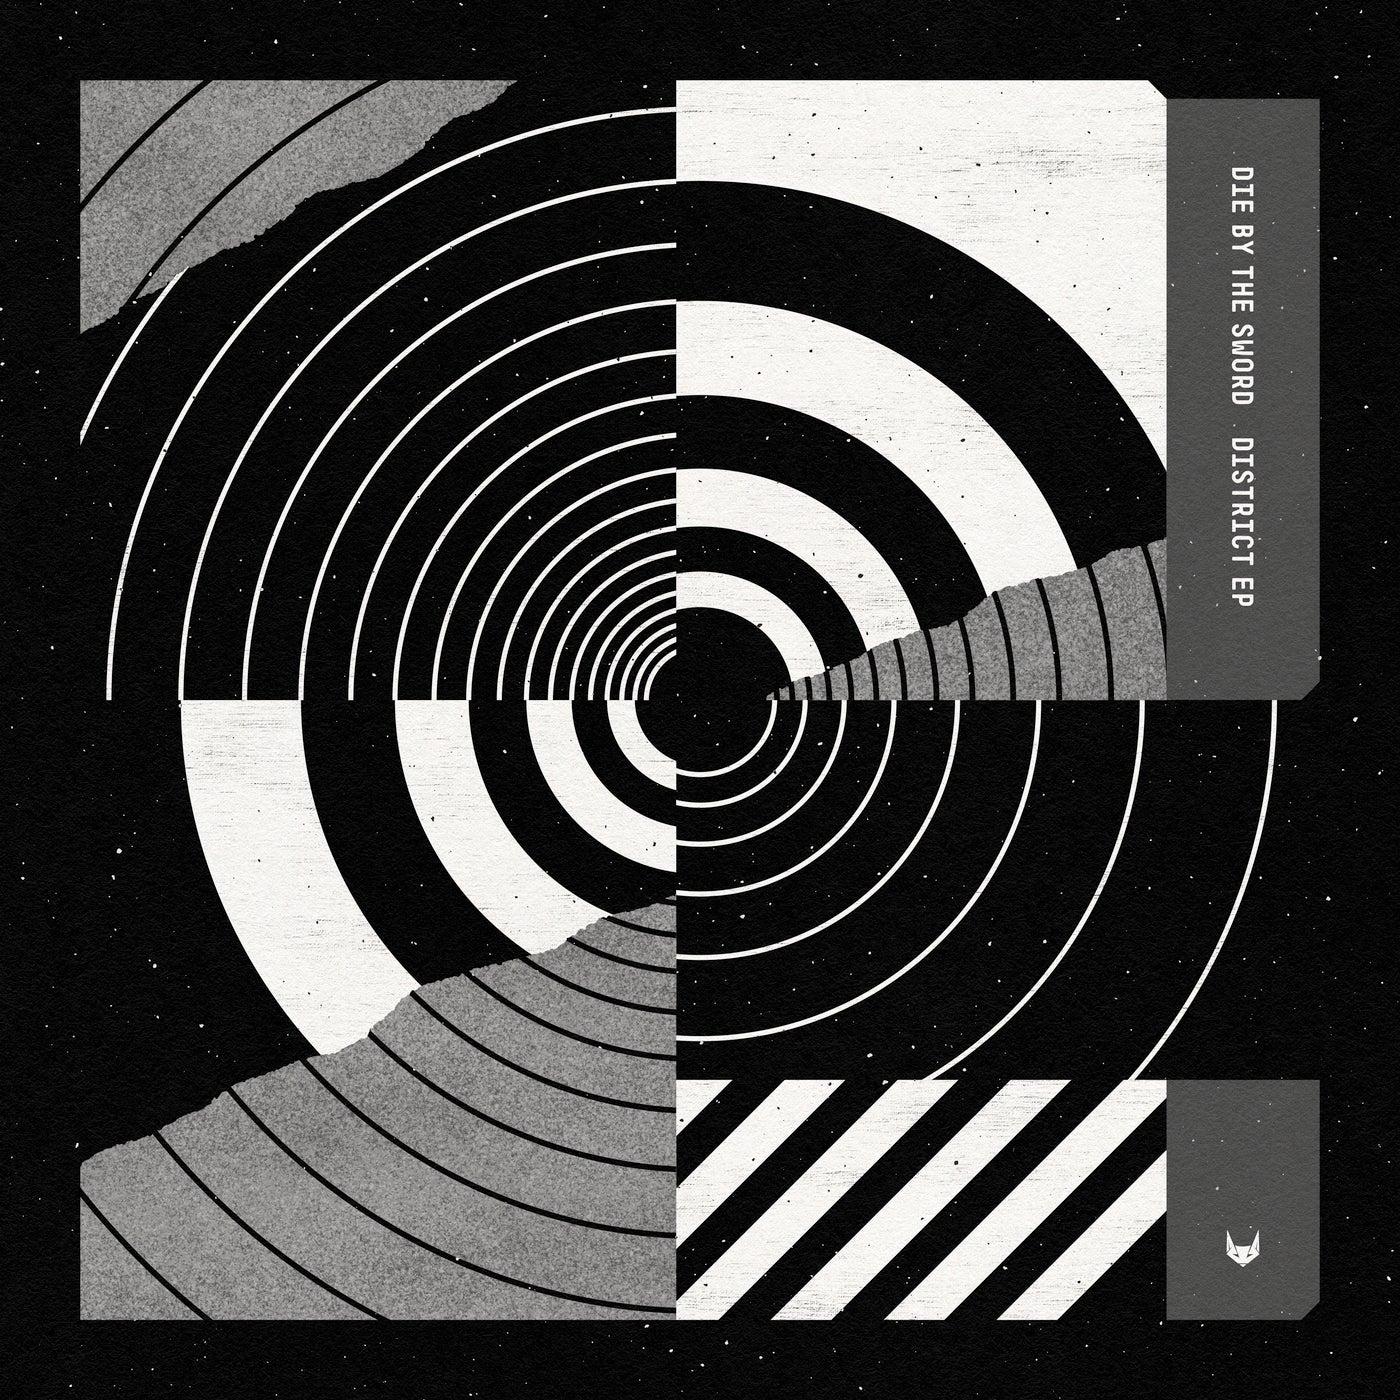 District (Original Mix)